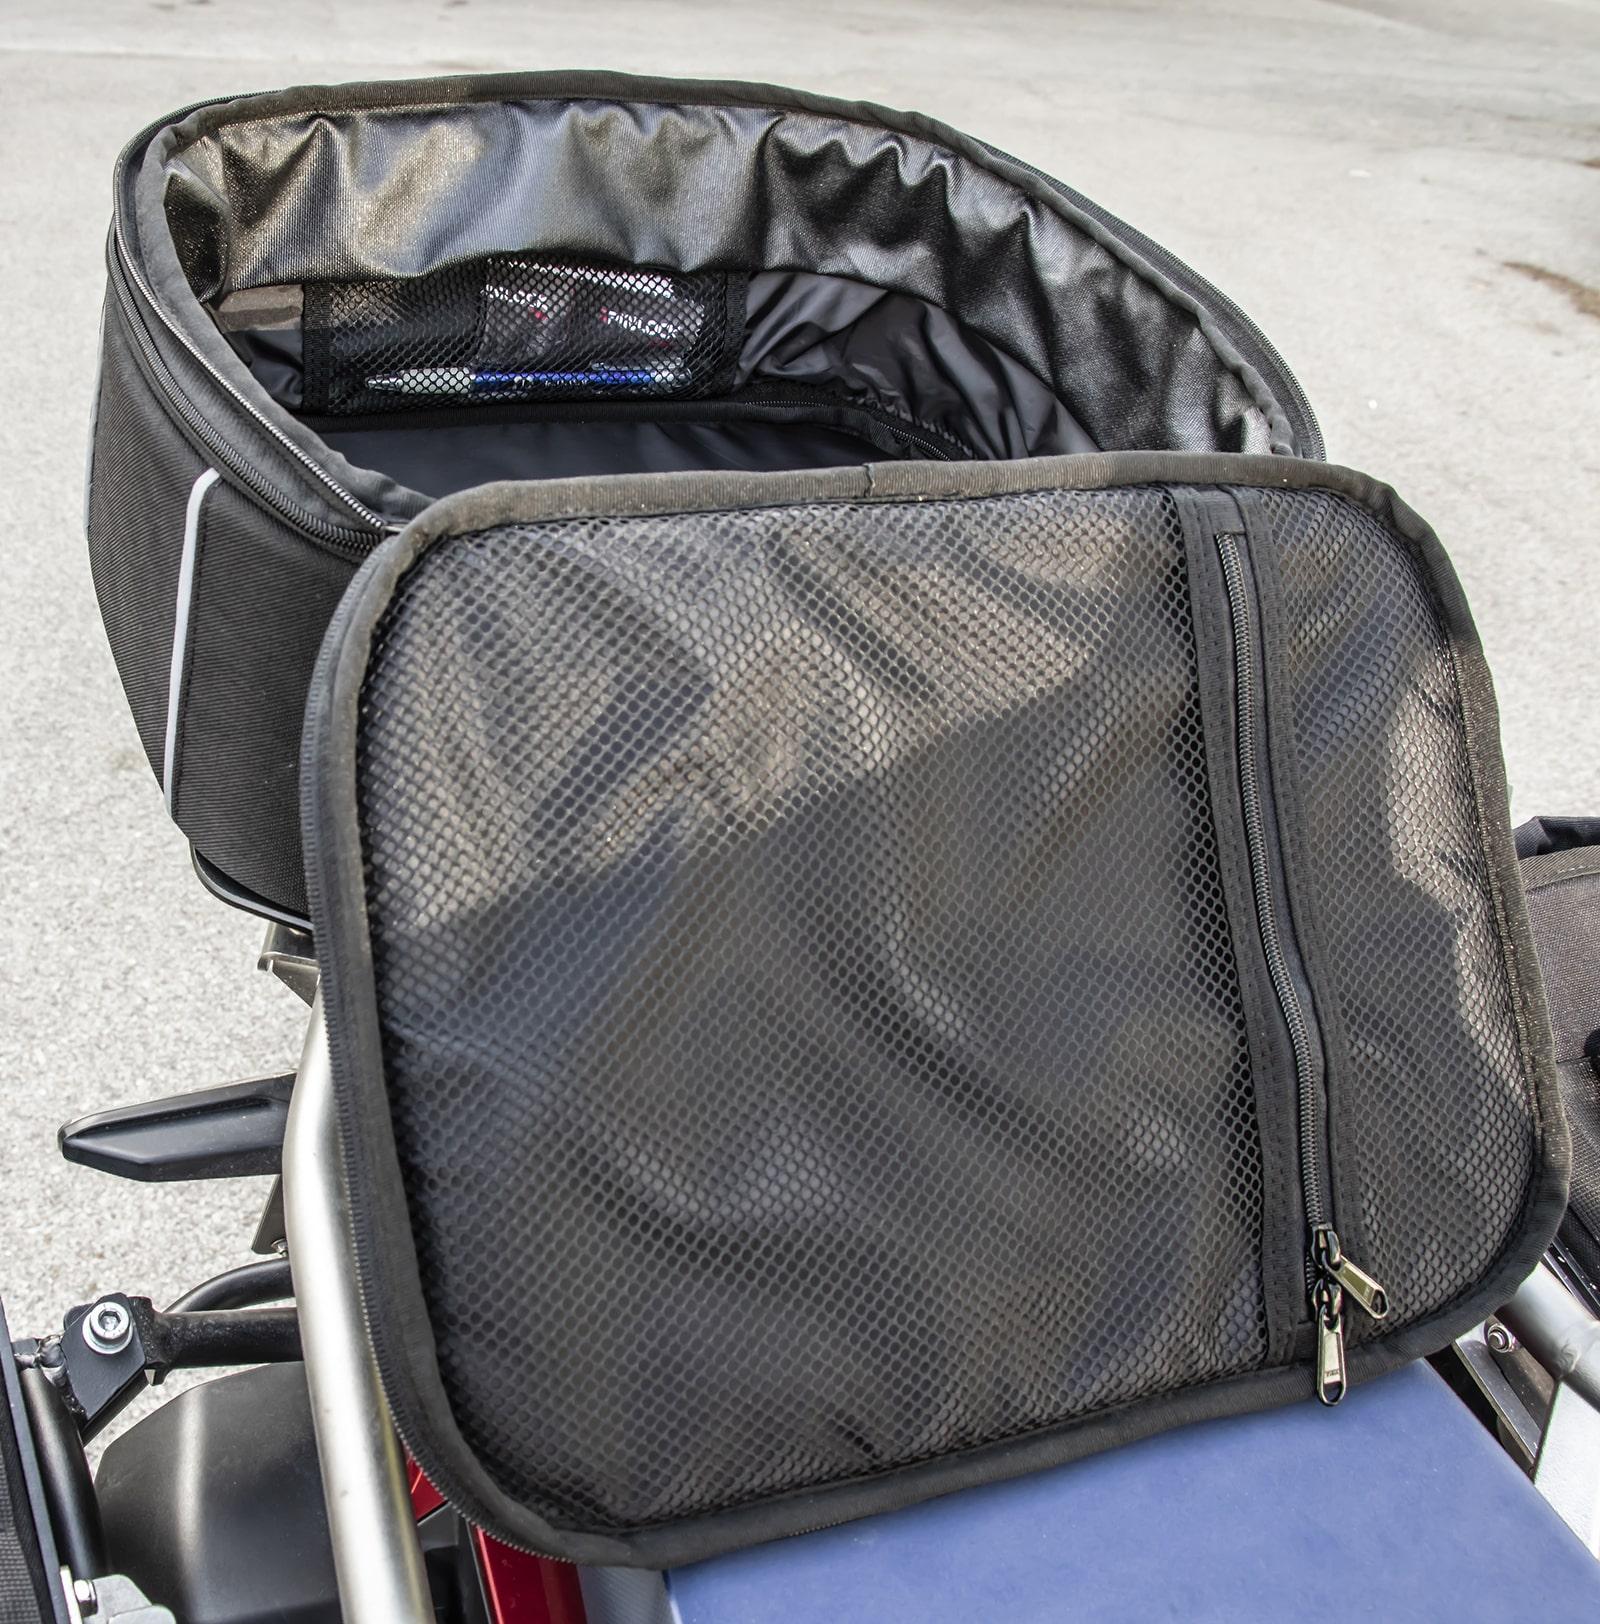 Xtremada Tail bag 27L